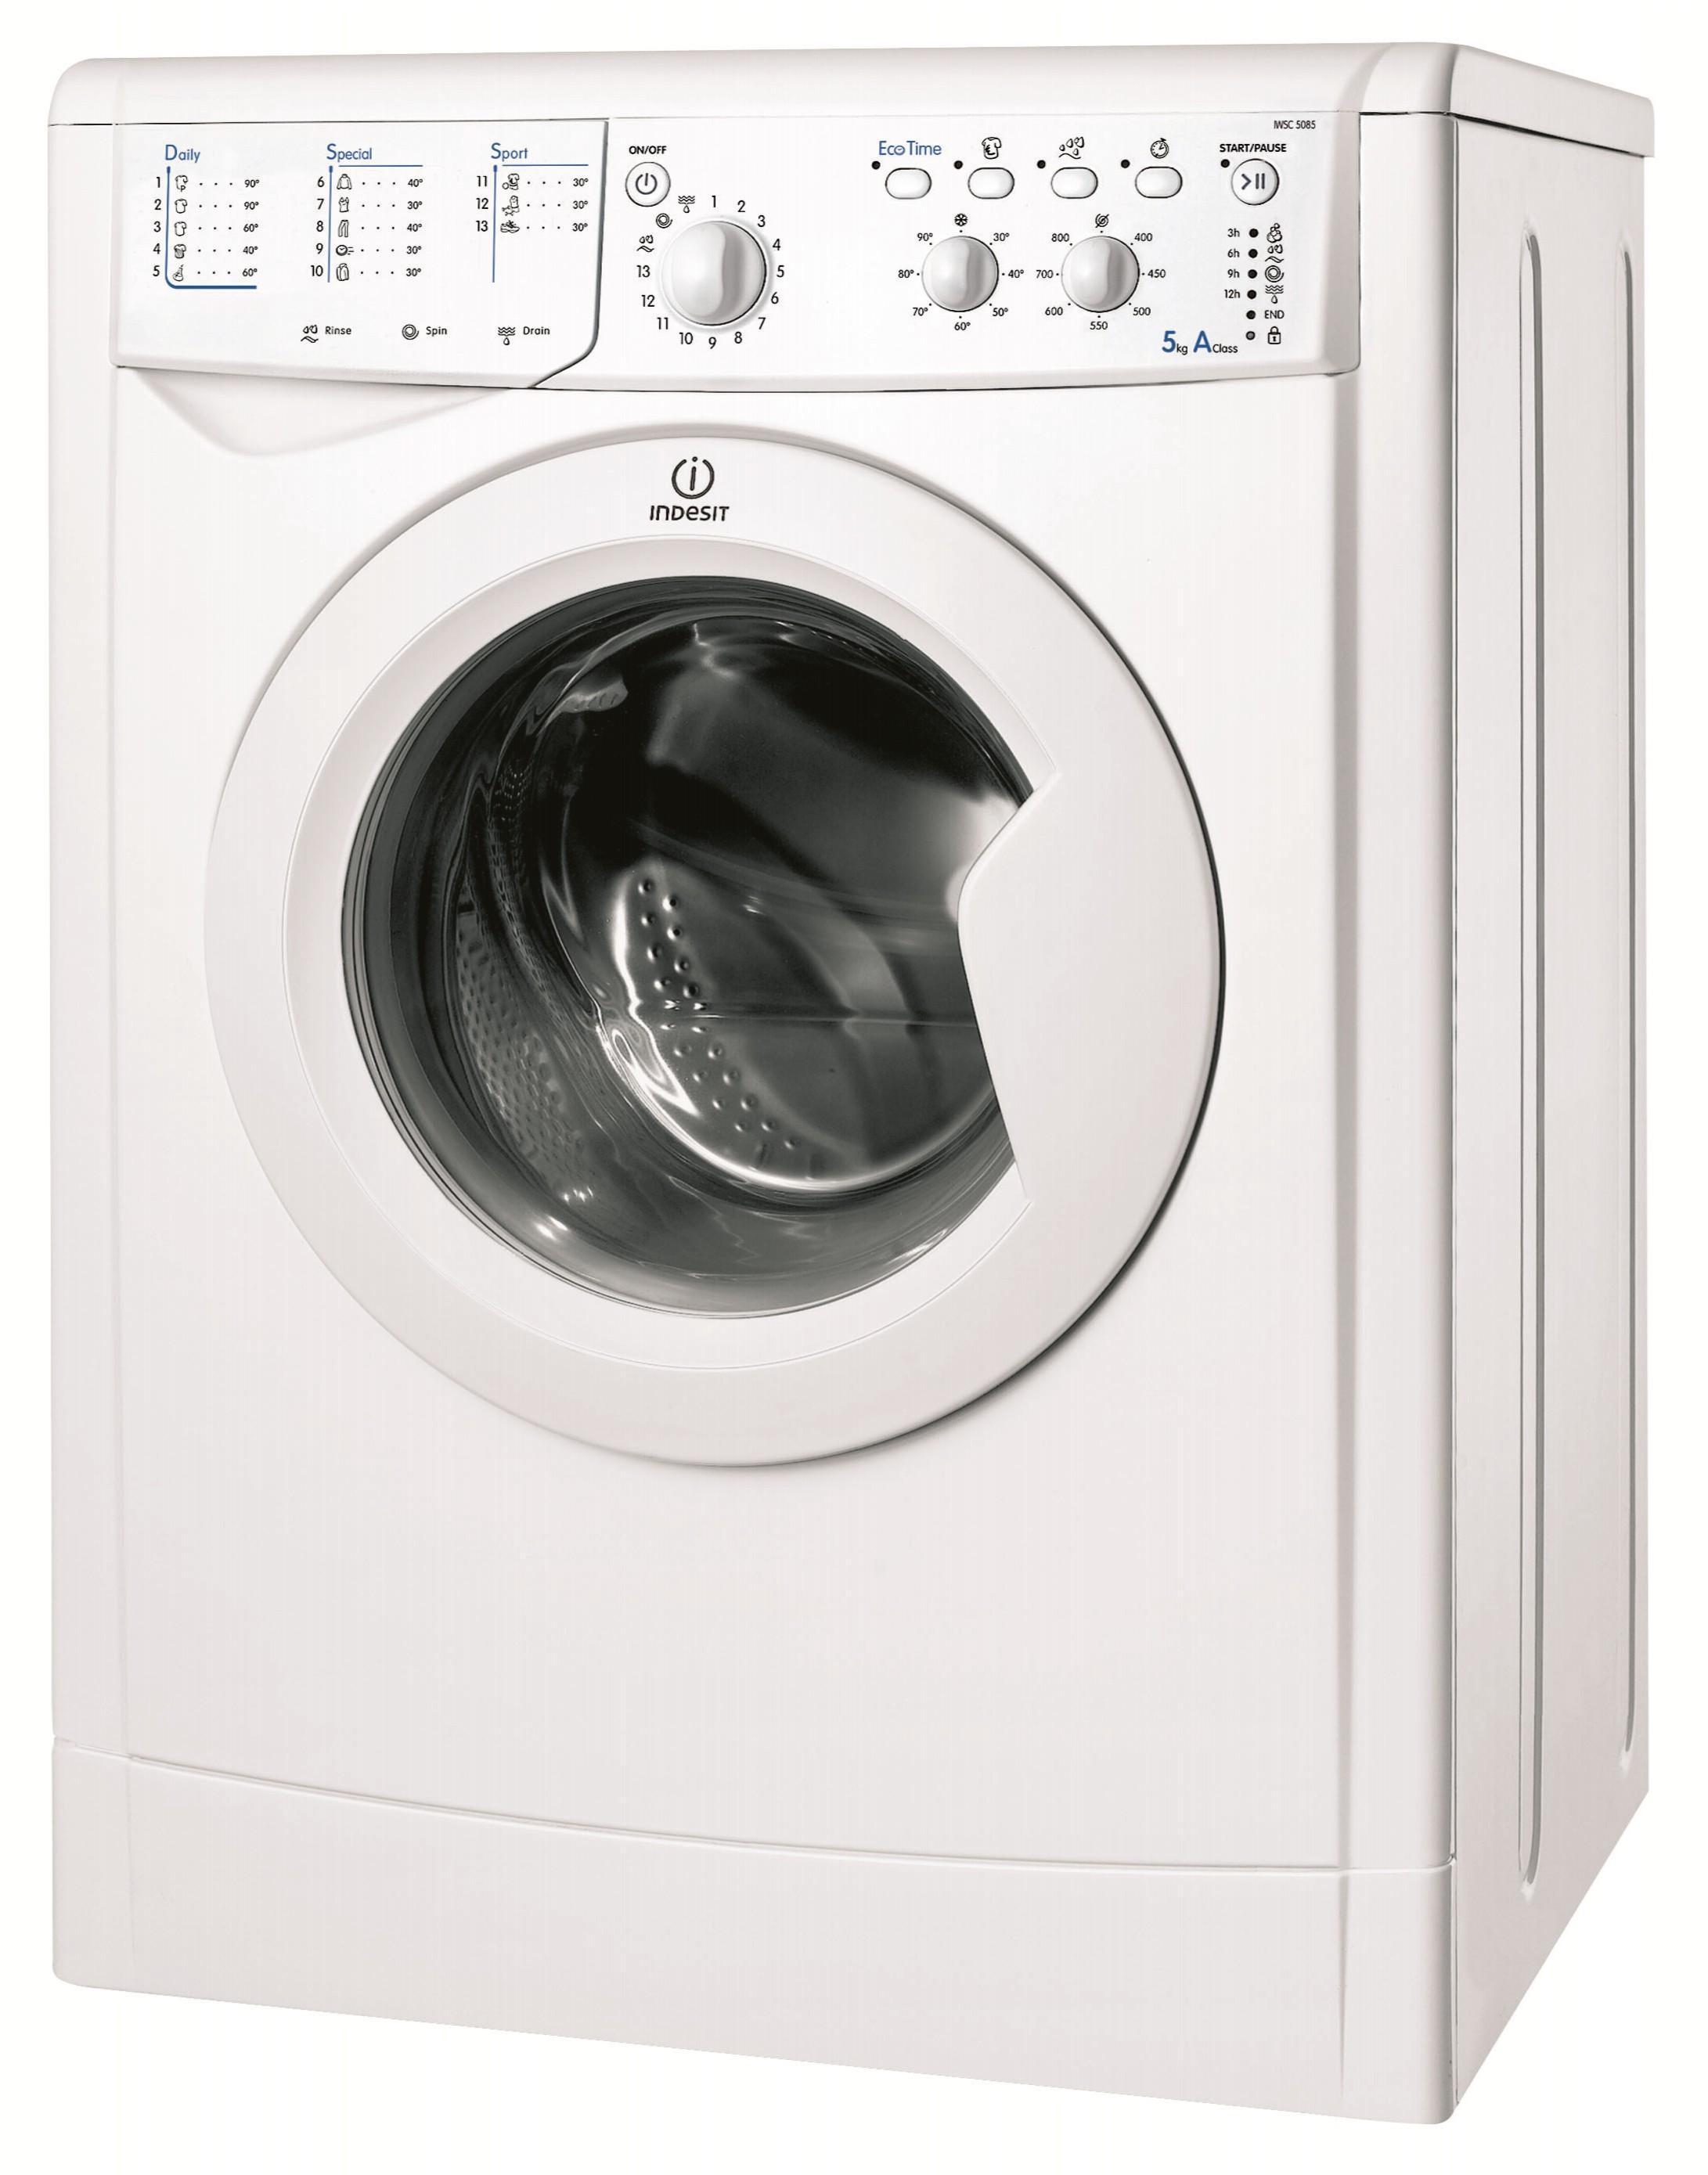 Indesit IWSC51051ECO 1000rpm 5kg Washing Machine White